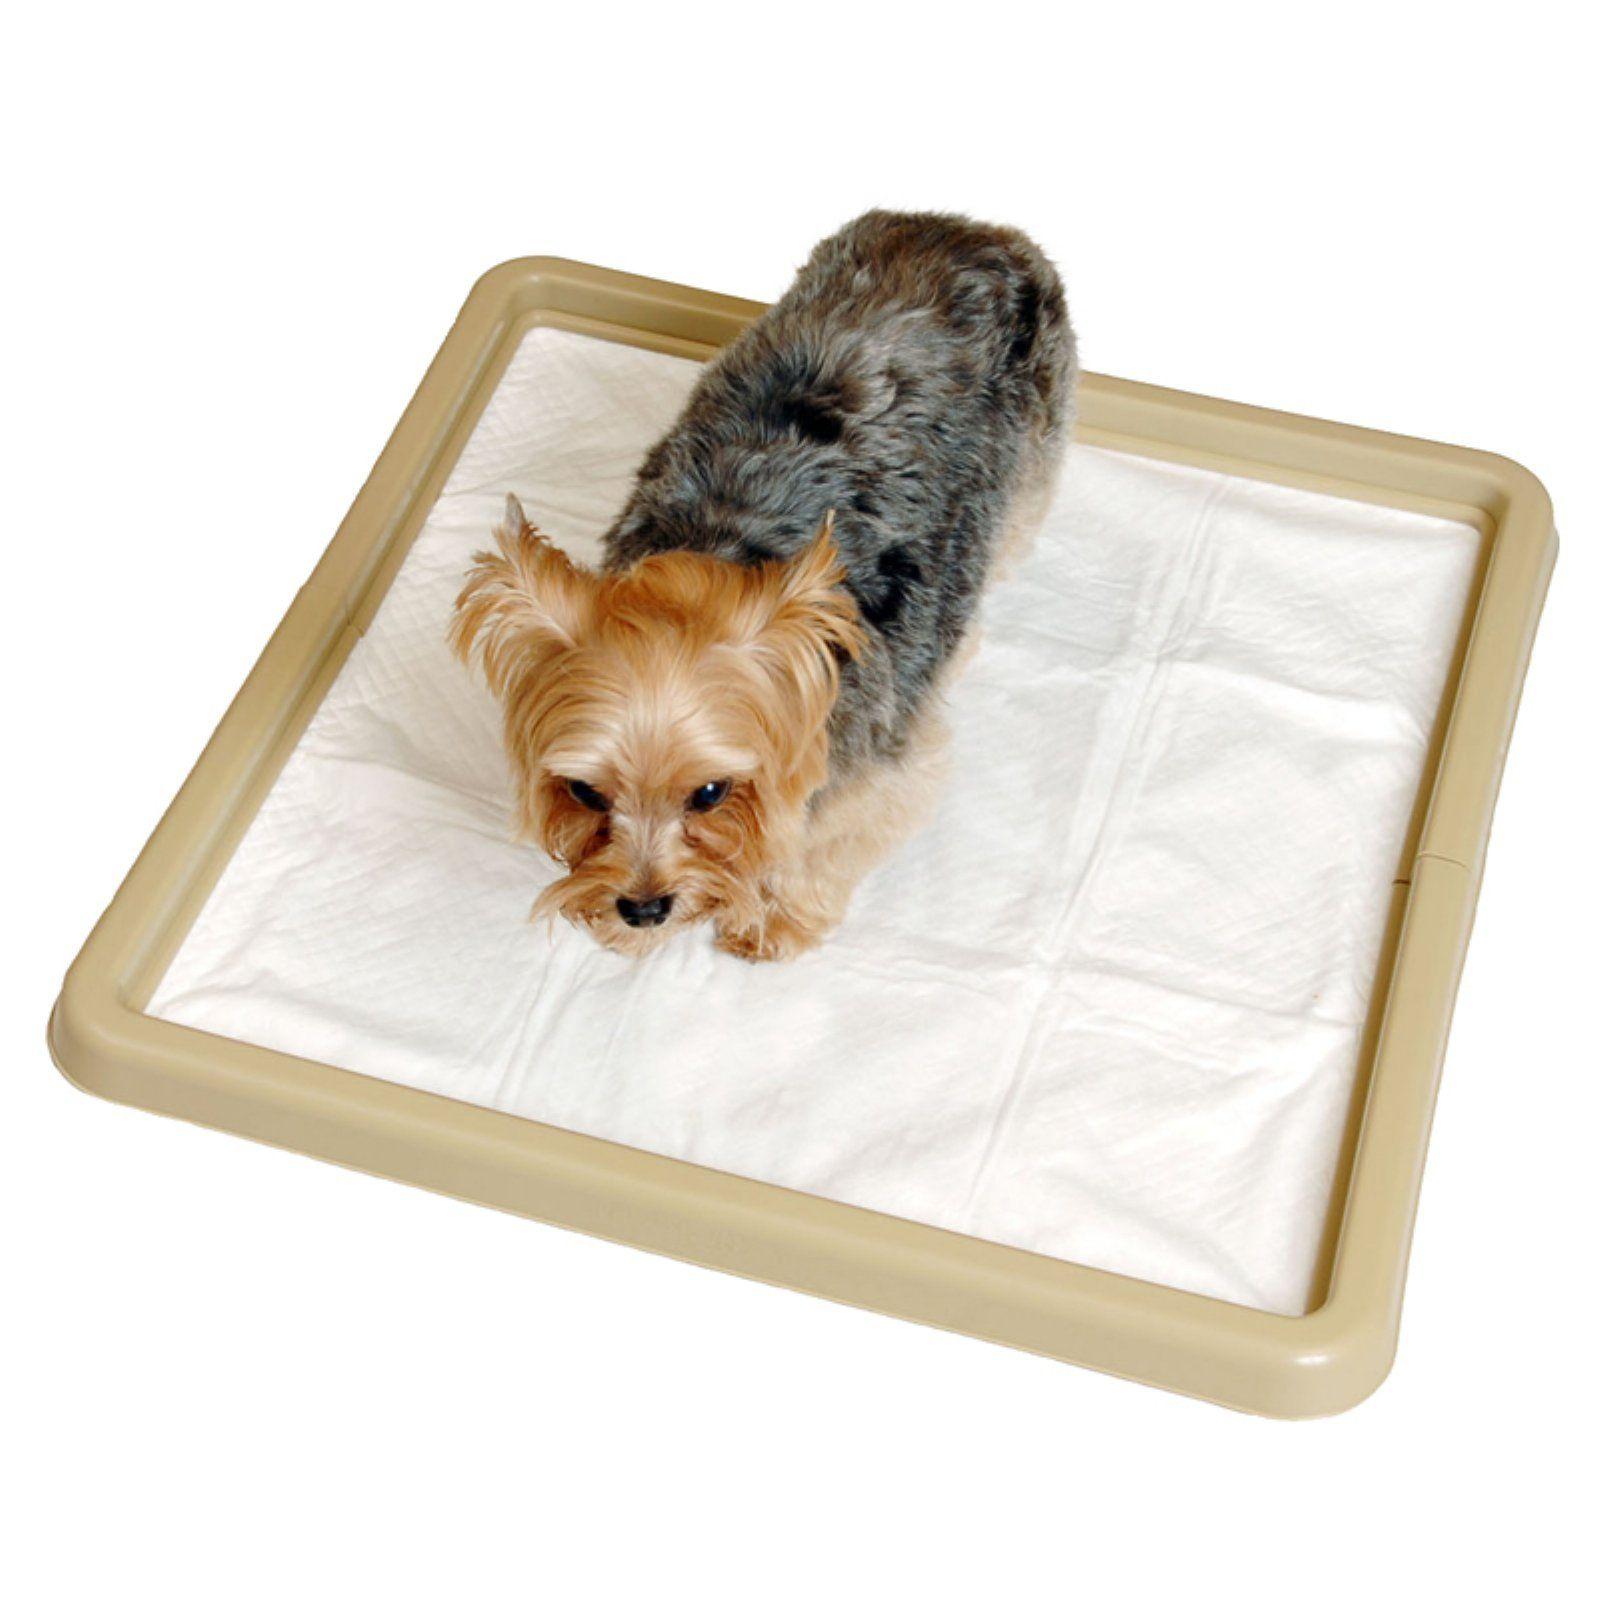 Petmate Little Stinker Housebreaking Pad Holder Pet Mat Puppies